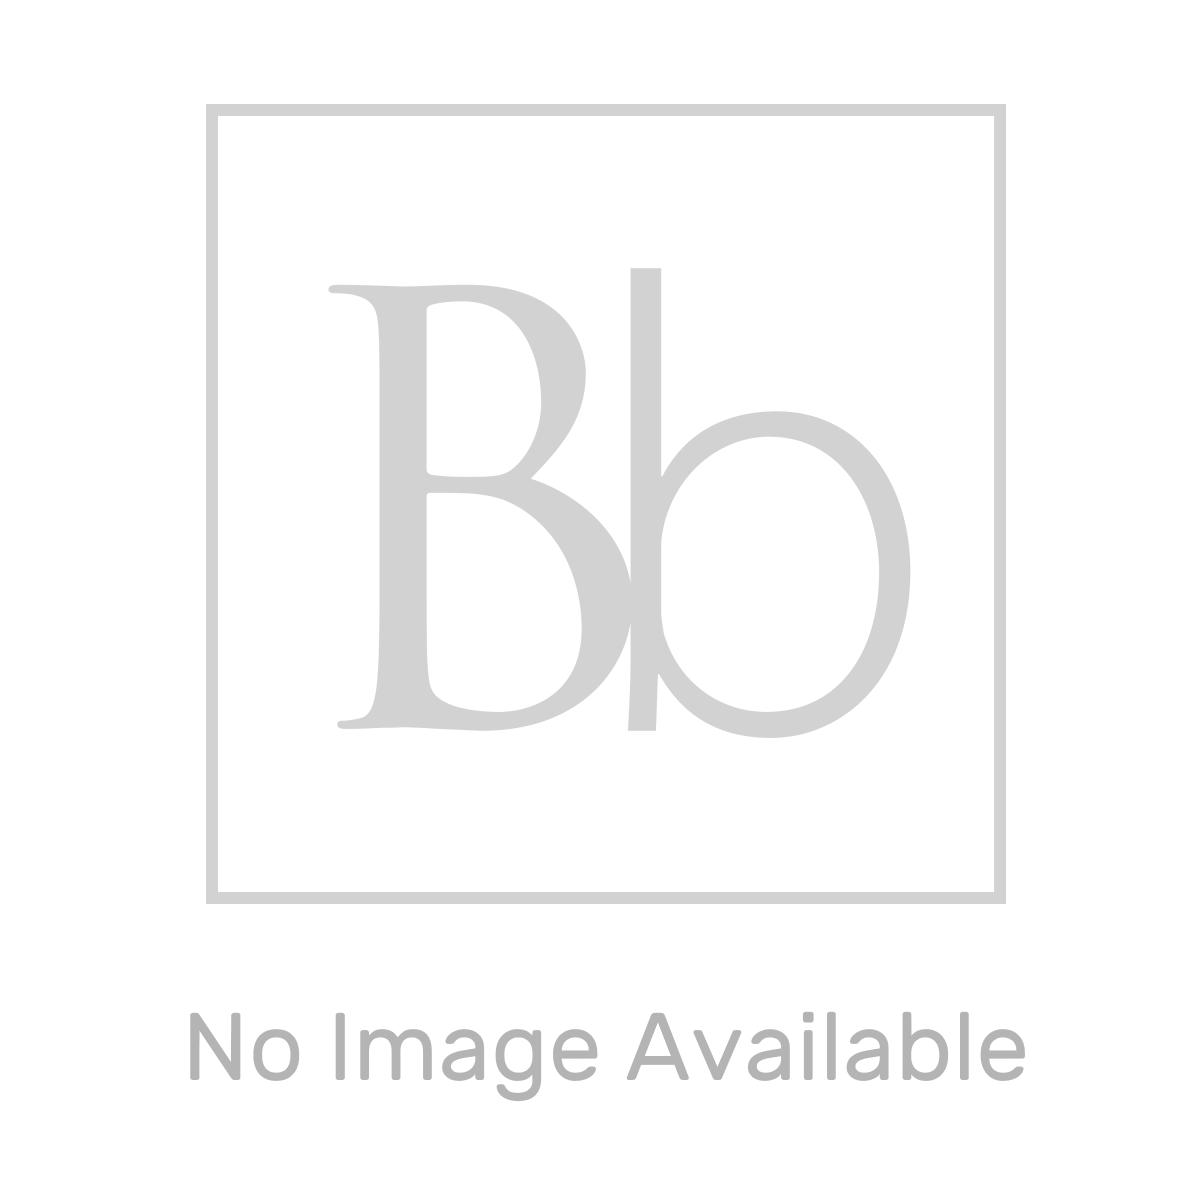 Nymas Stainless Steel Grey Grab Rail